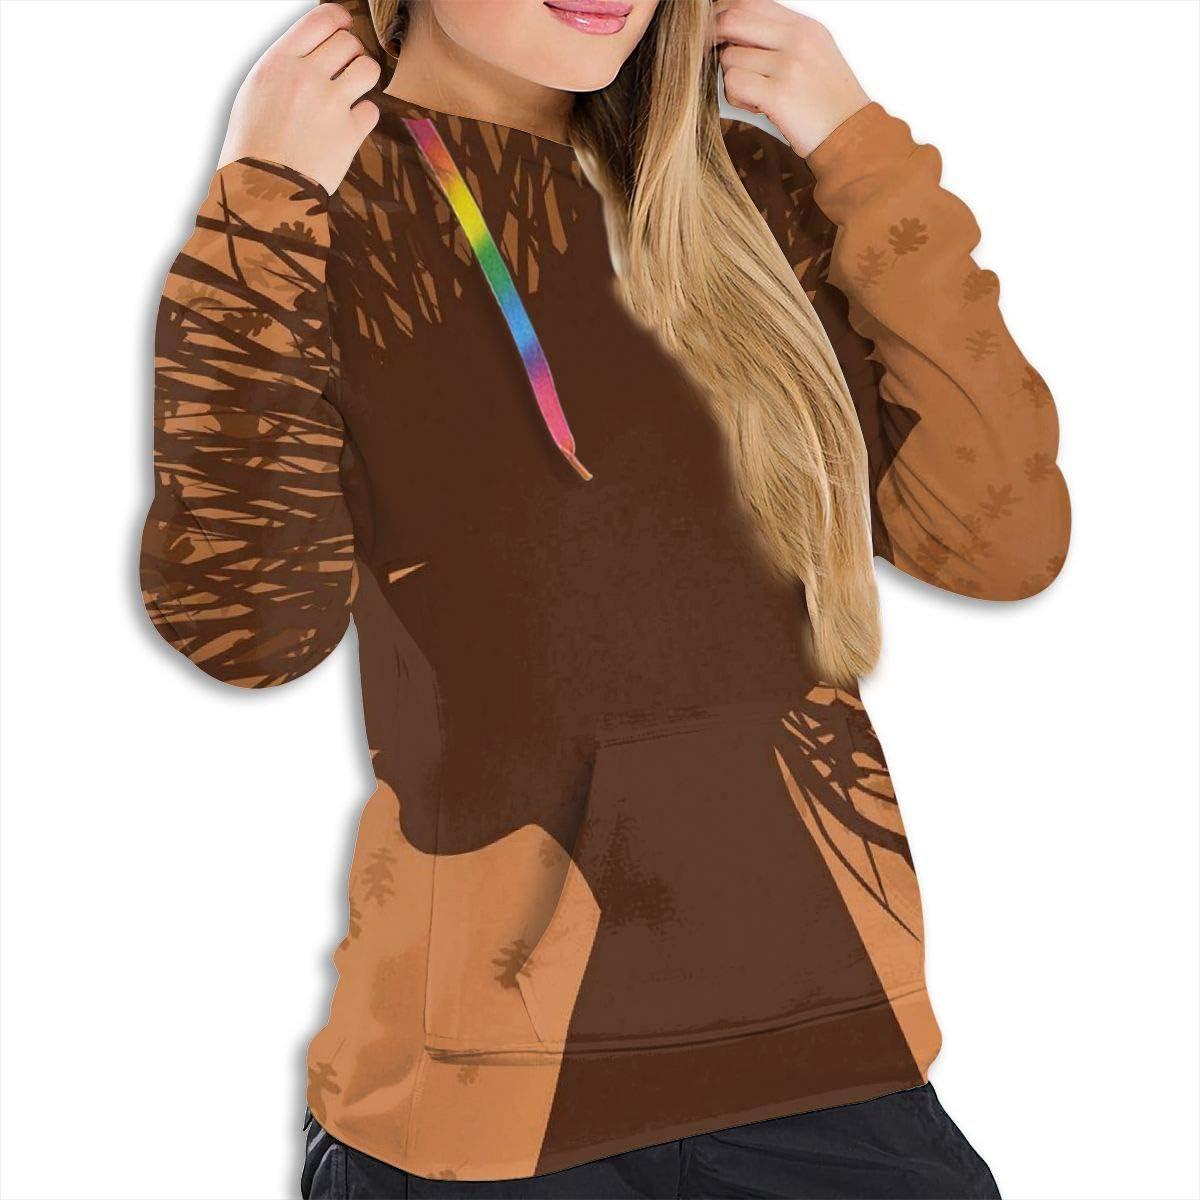 Womens Hoodie,Autumnal Elements Bushes Leaves Punk Hair Woman Head Pattern,Lady Sweatshirt